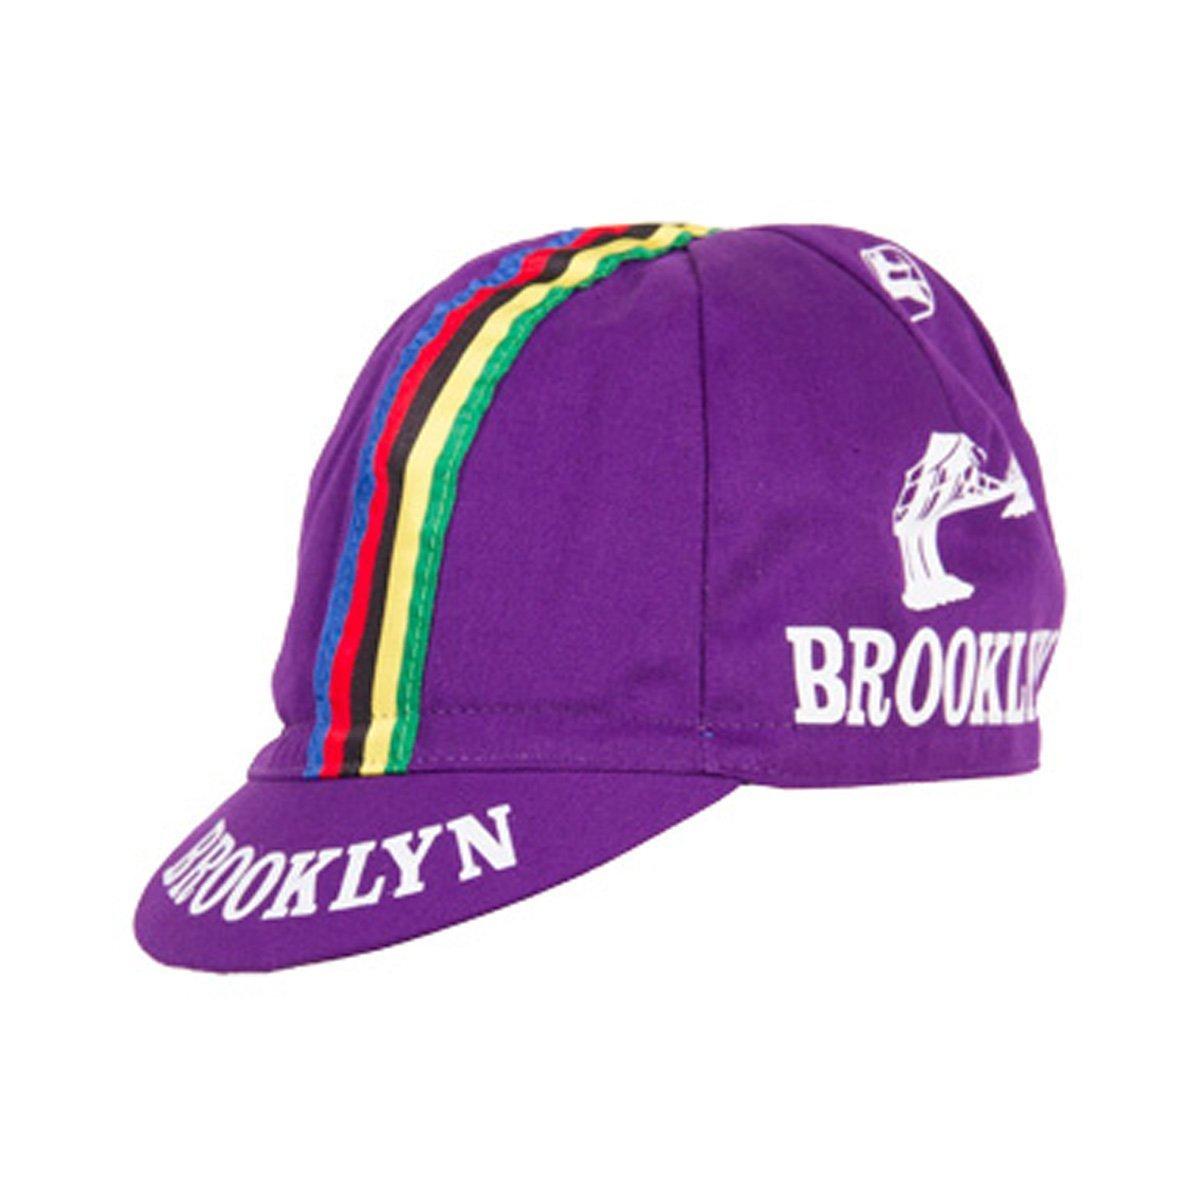 World Stripes Giordana 2016 Brooklyn Team Cycling Cap gi-s2-coca-brok